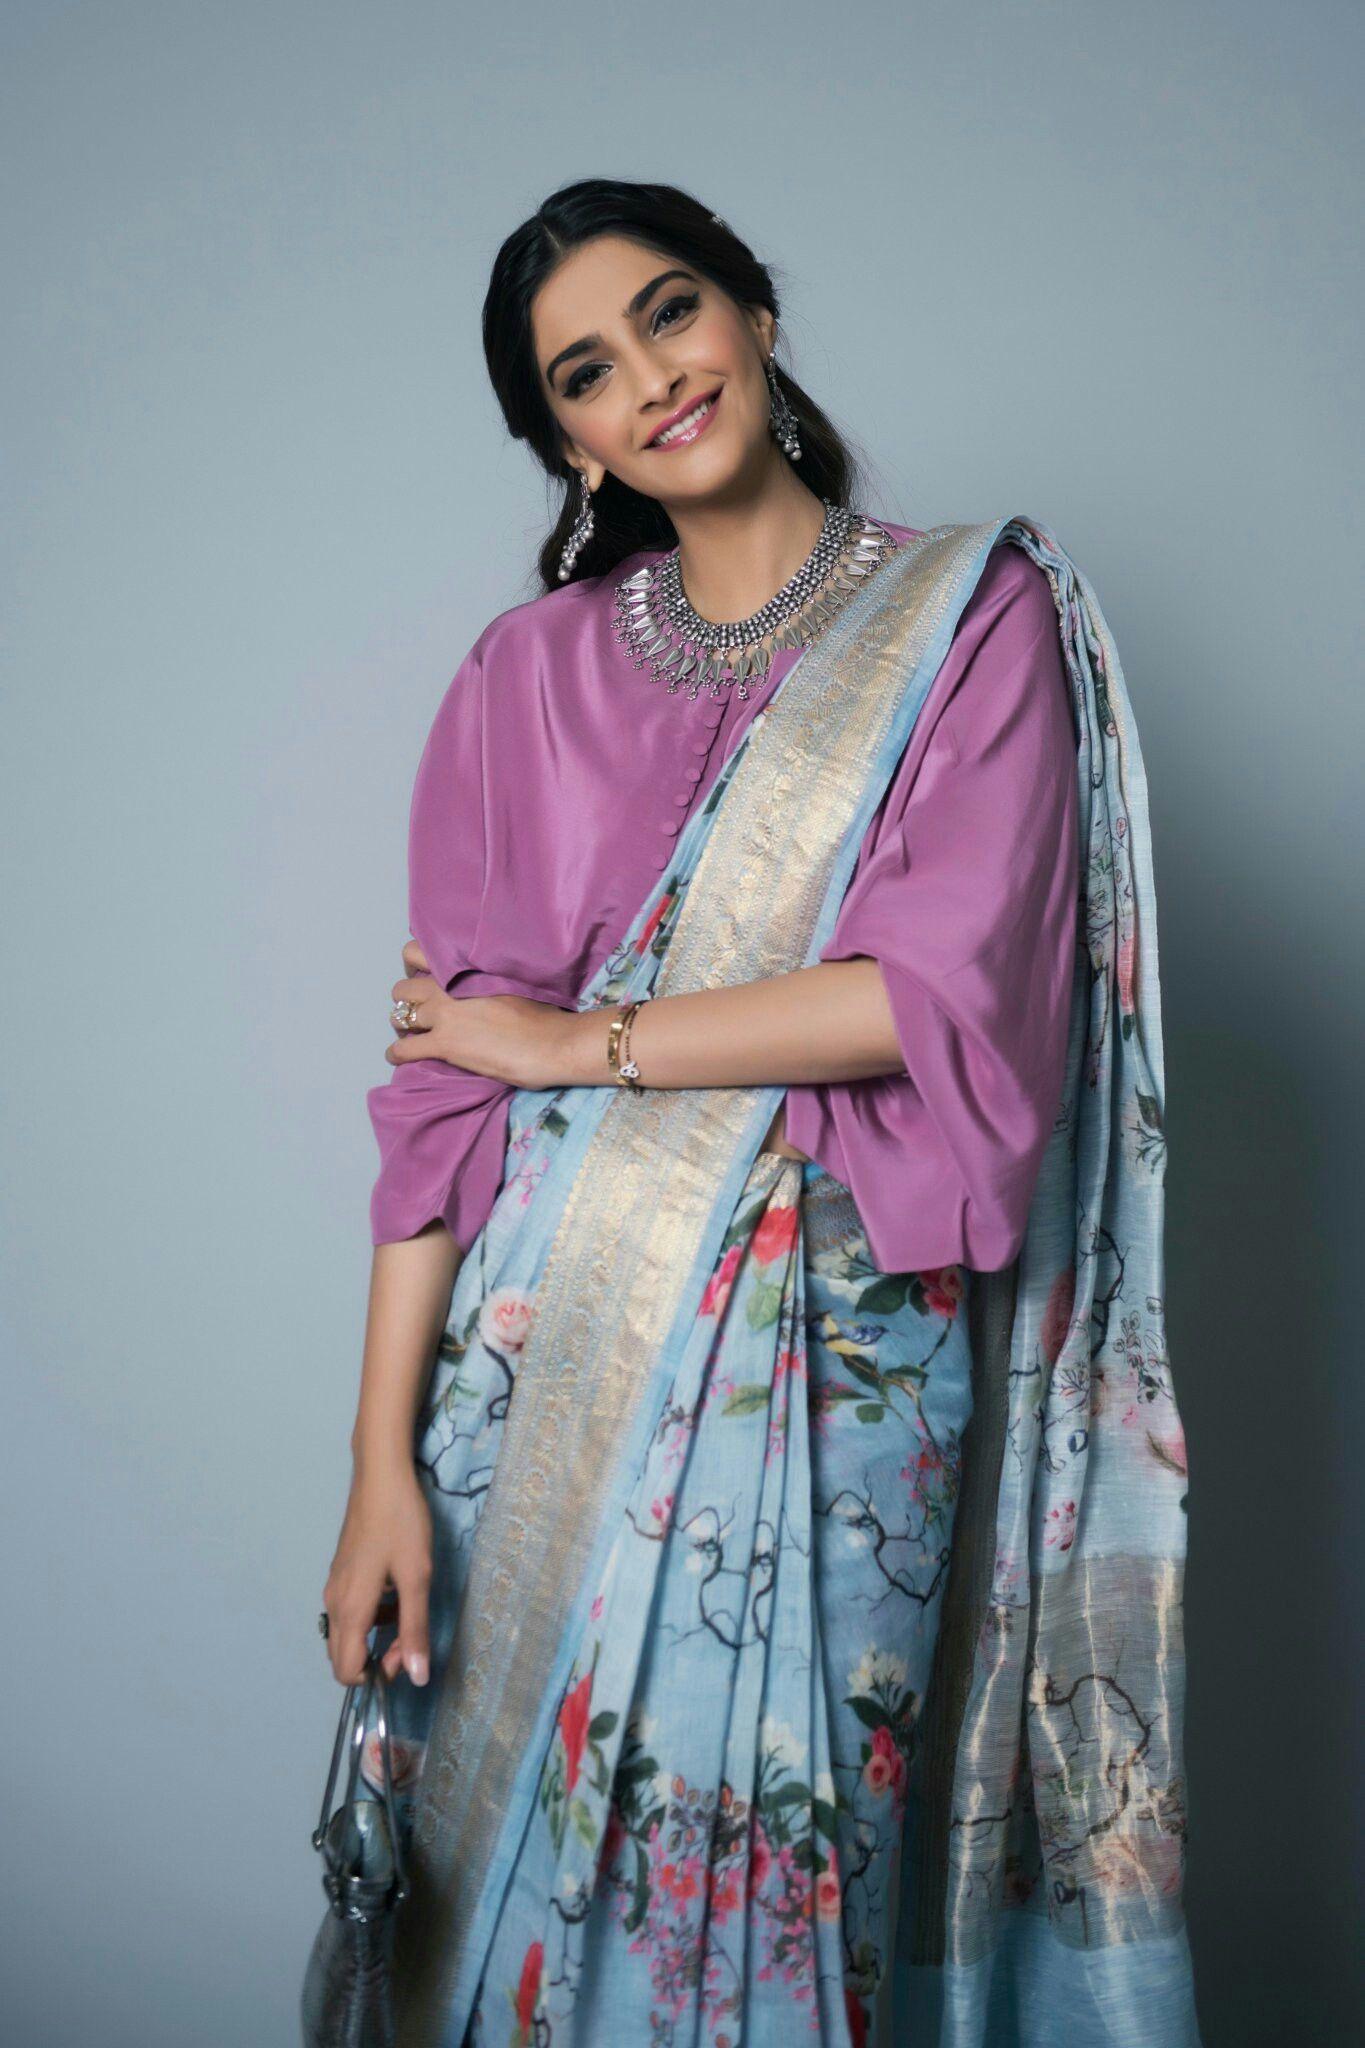 2b5bf9c0fc44e Saree Wearing Styles, Saree Styles, Sonam Kapoor Wedding, Veere Di Wedding,  Trendy